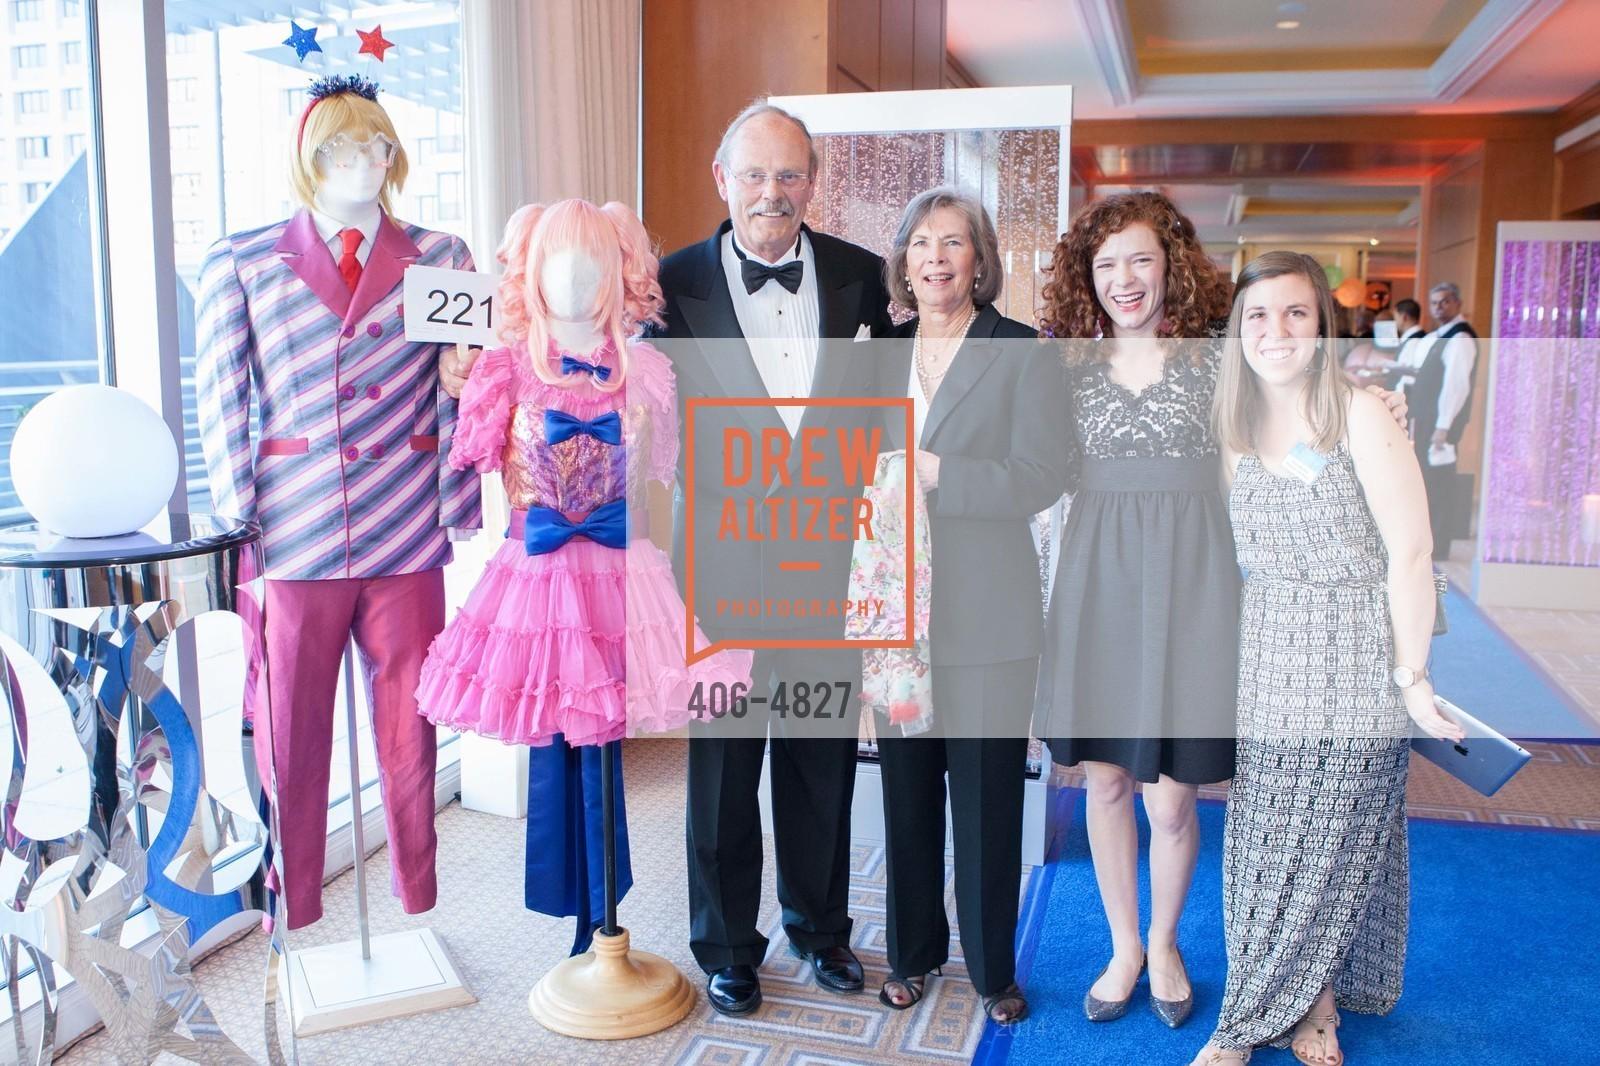 Craig Moody, Kathy Moody, Shelly Jackson, Krista Worthen, Photo #406-4827